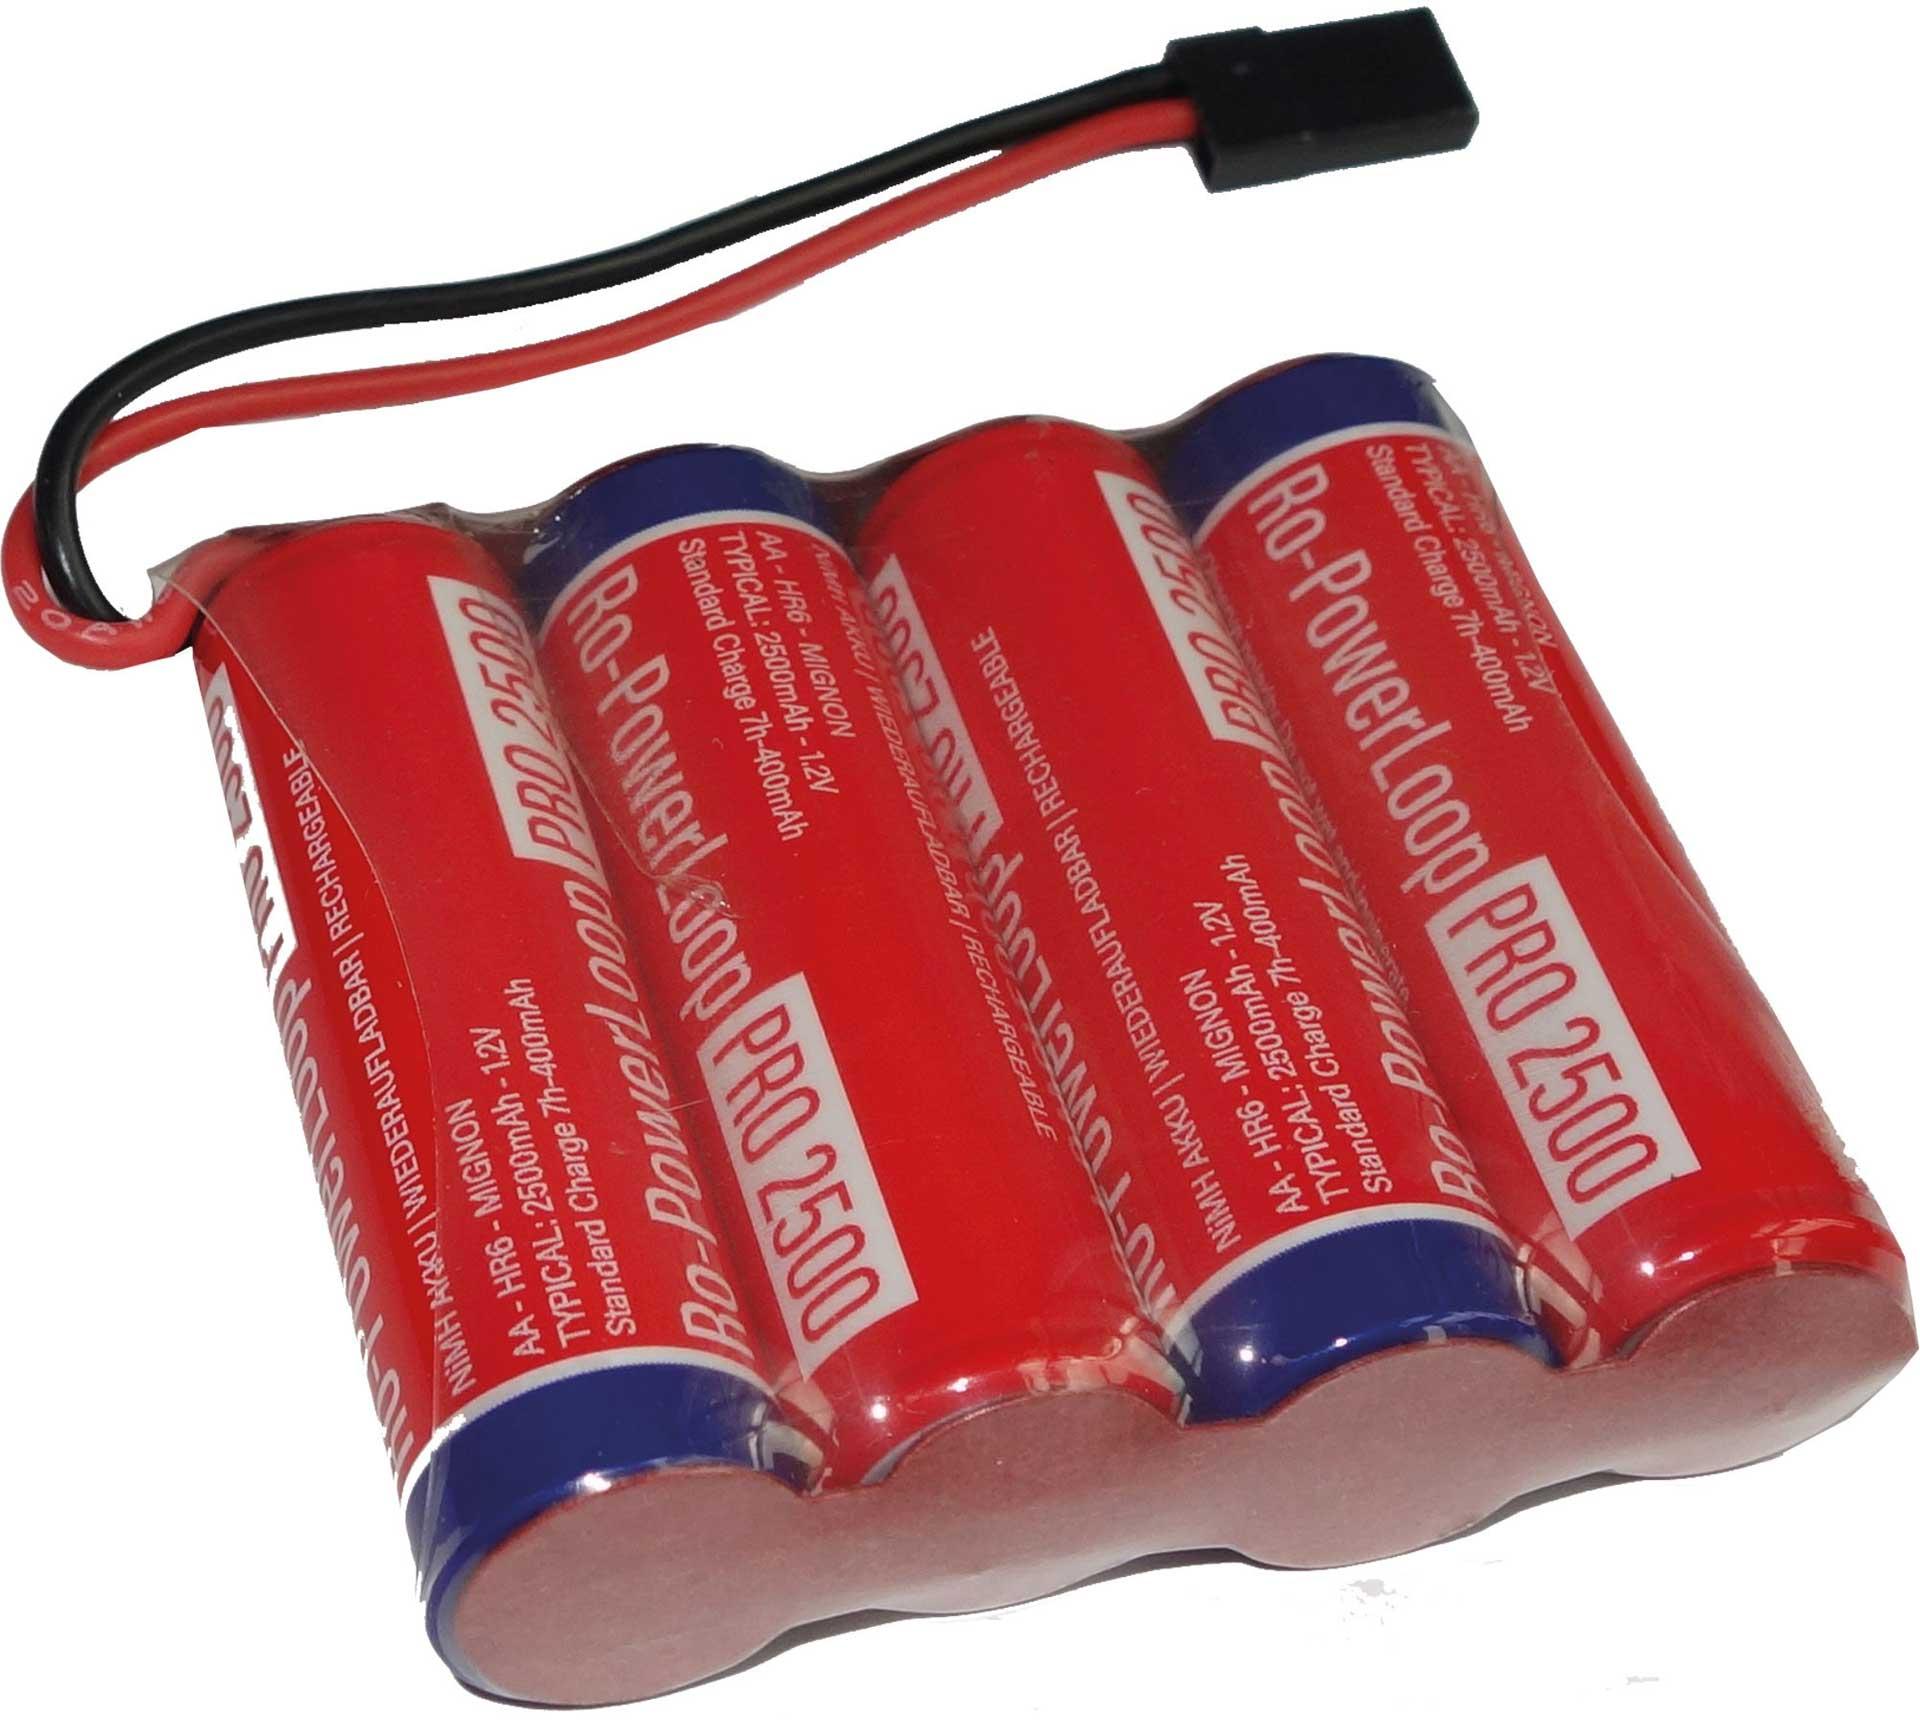 ROBBE RO-POWER LOOP MIGNON AA 2500 MAH 4.8 V RECEIVER BATTERY JR CABLE, ROW